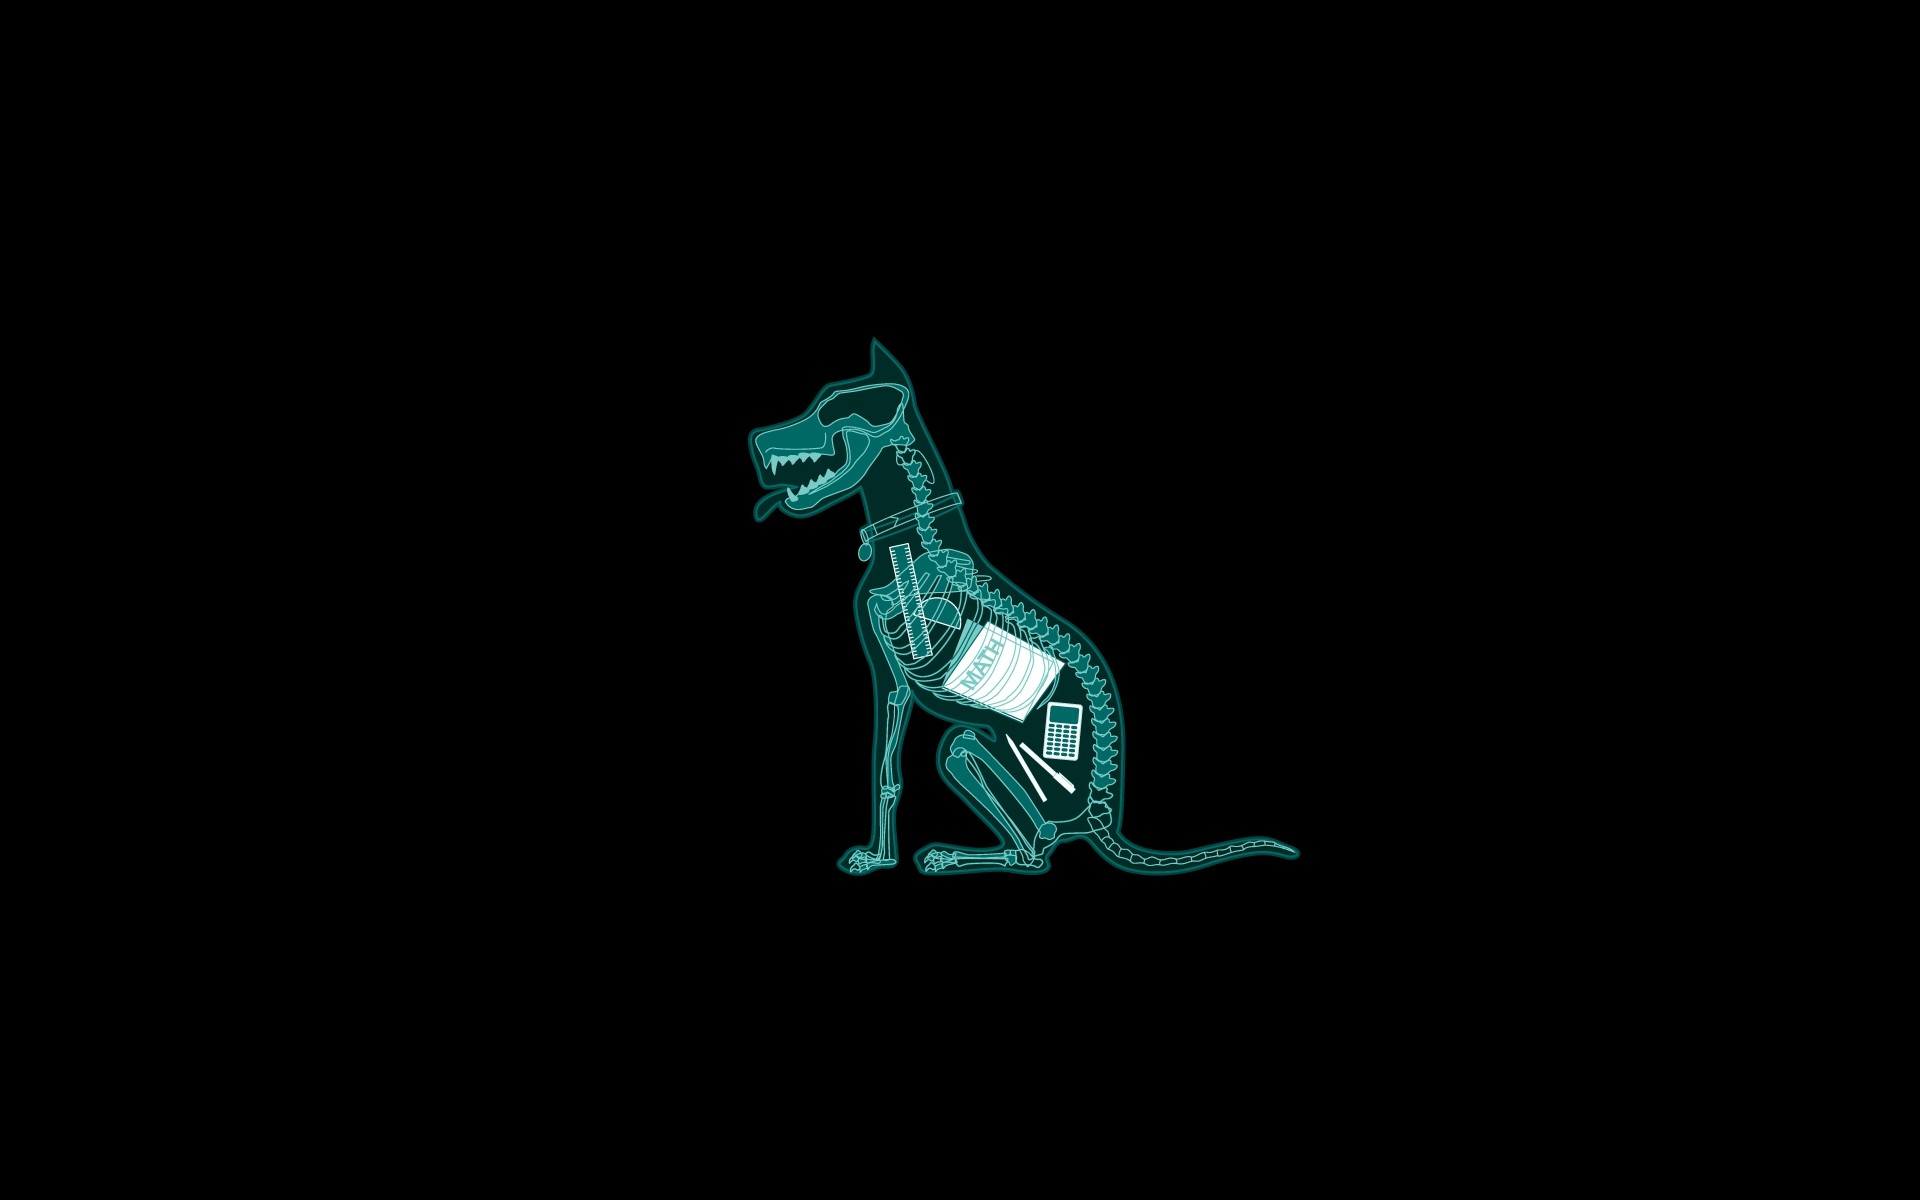 Dog skeleton funny wallpaper